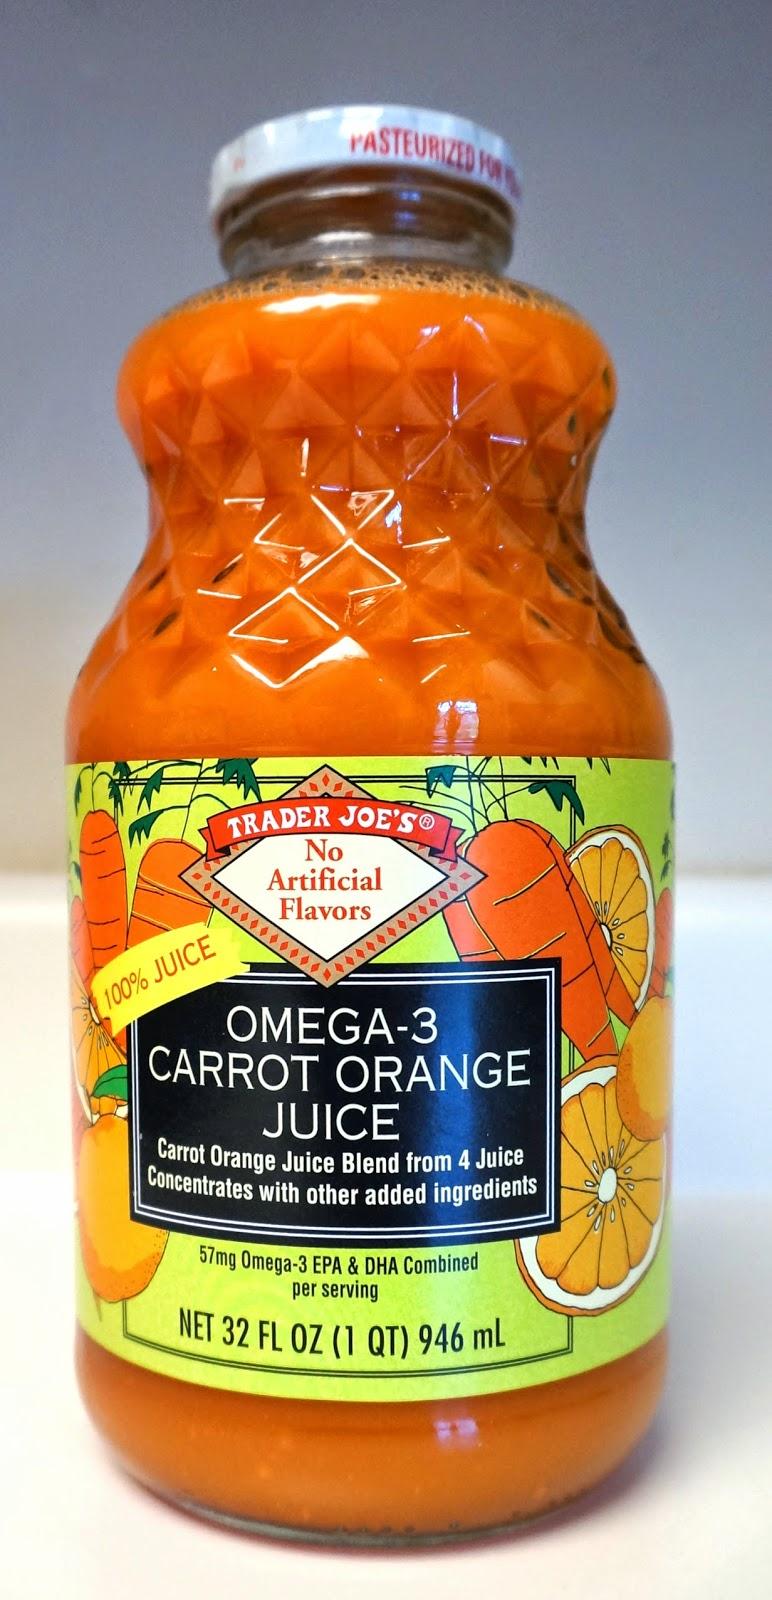 Exploring trader joe 39 s trader joe 39 s omega 3 carrot orange for Trader joe s fish oil